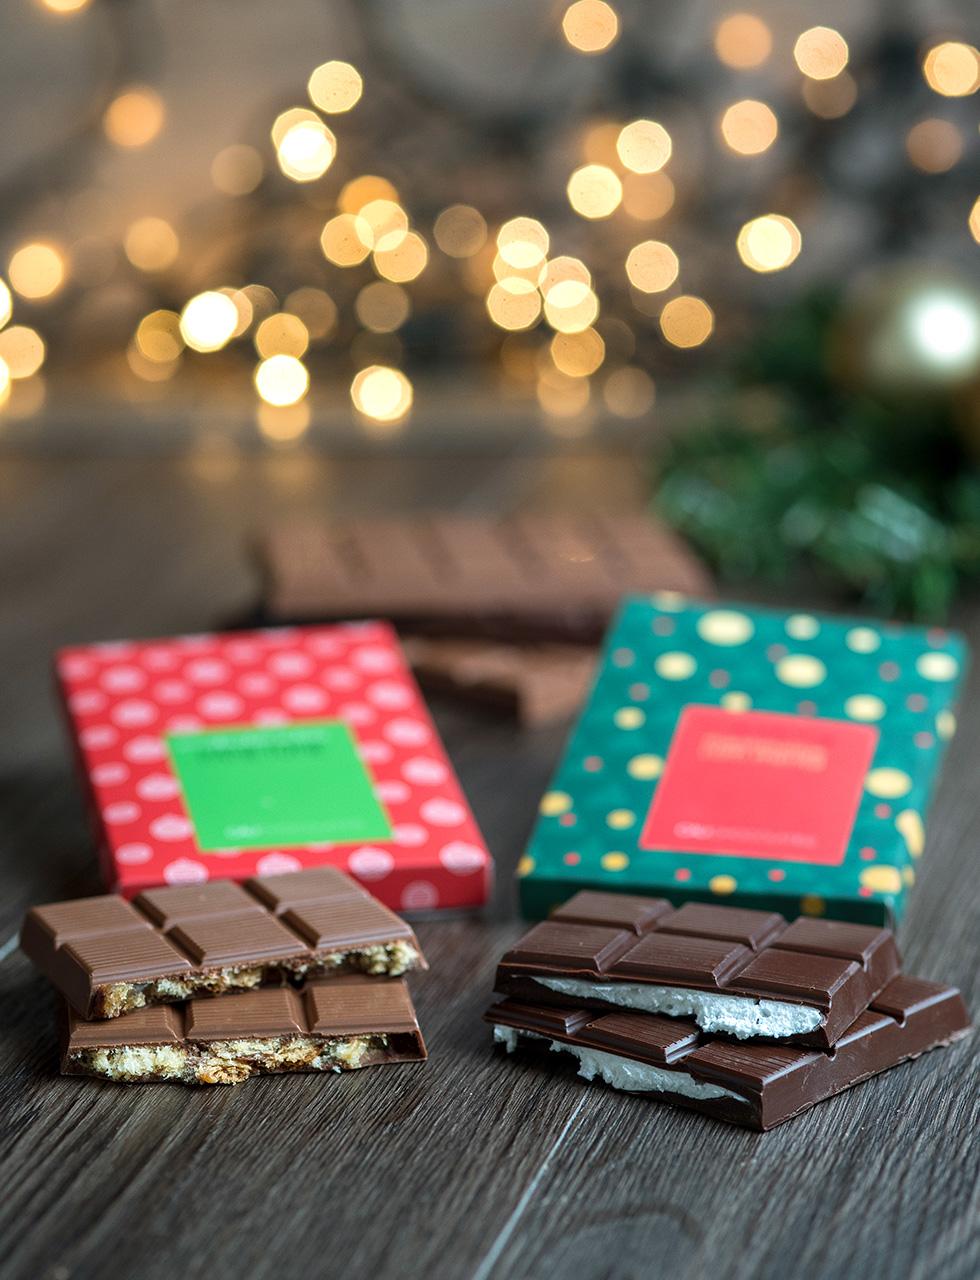 Barra de chocolate recheada cod 1751 - panetone 100 g - R$ 38 cod 1741 - marshmallow com menta 100 g - R$ 38